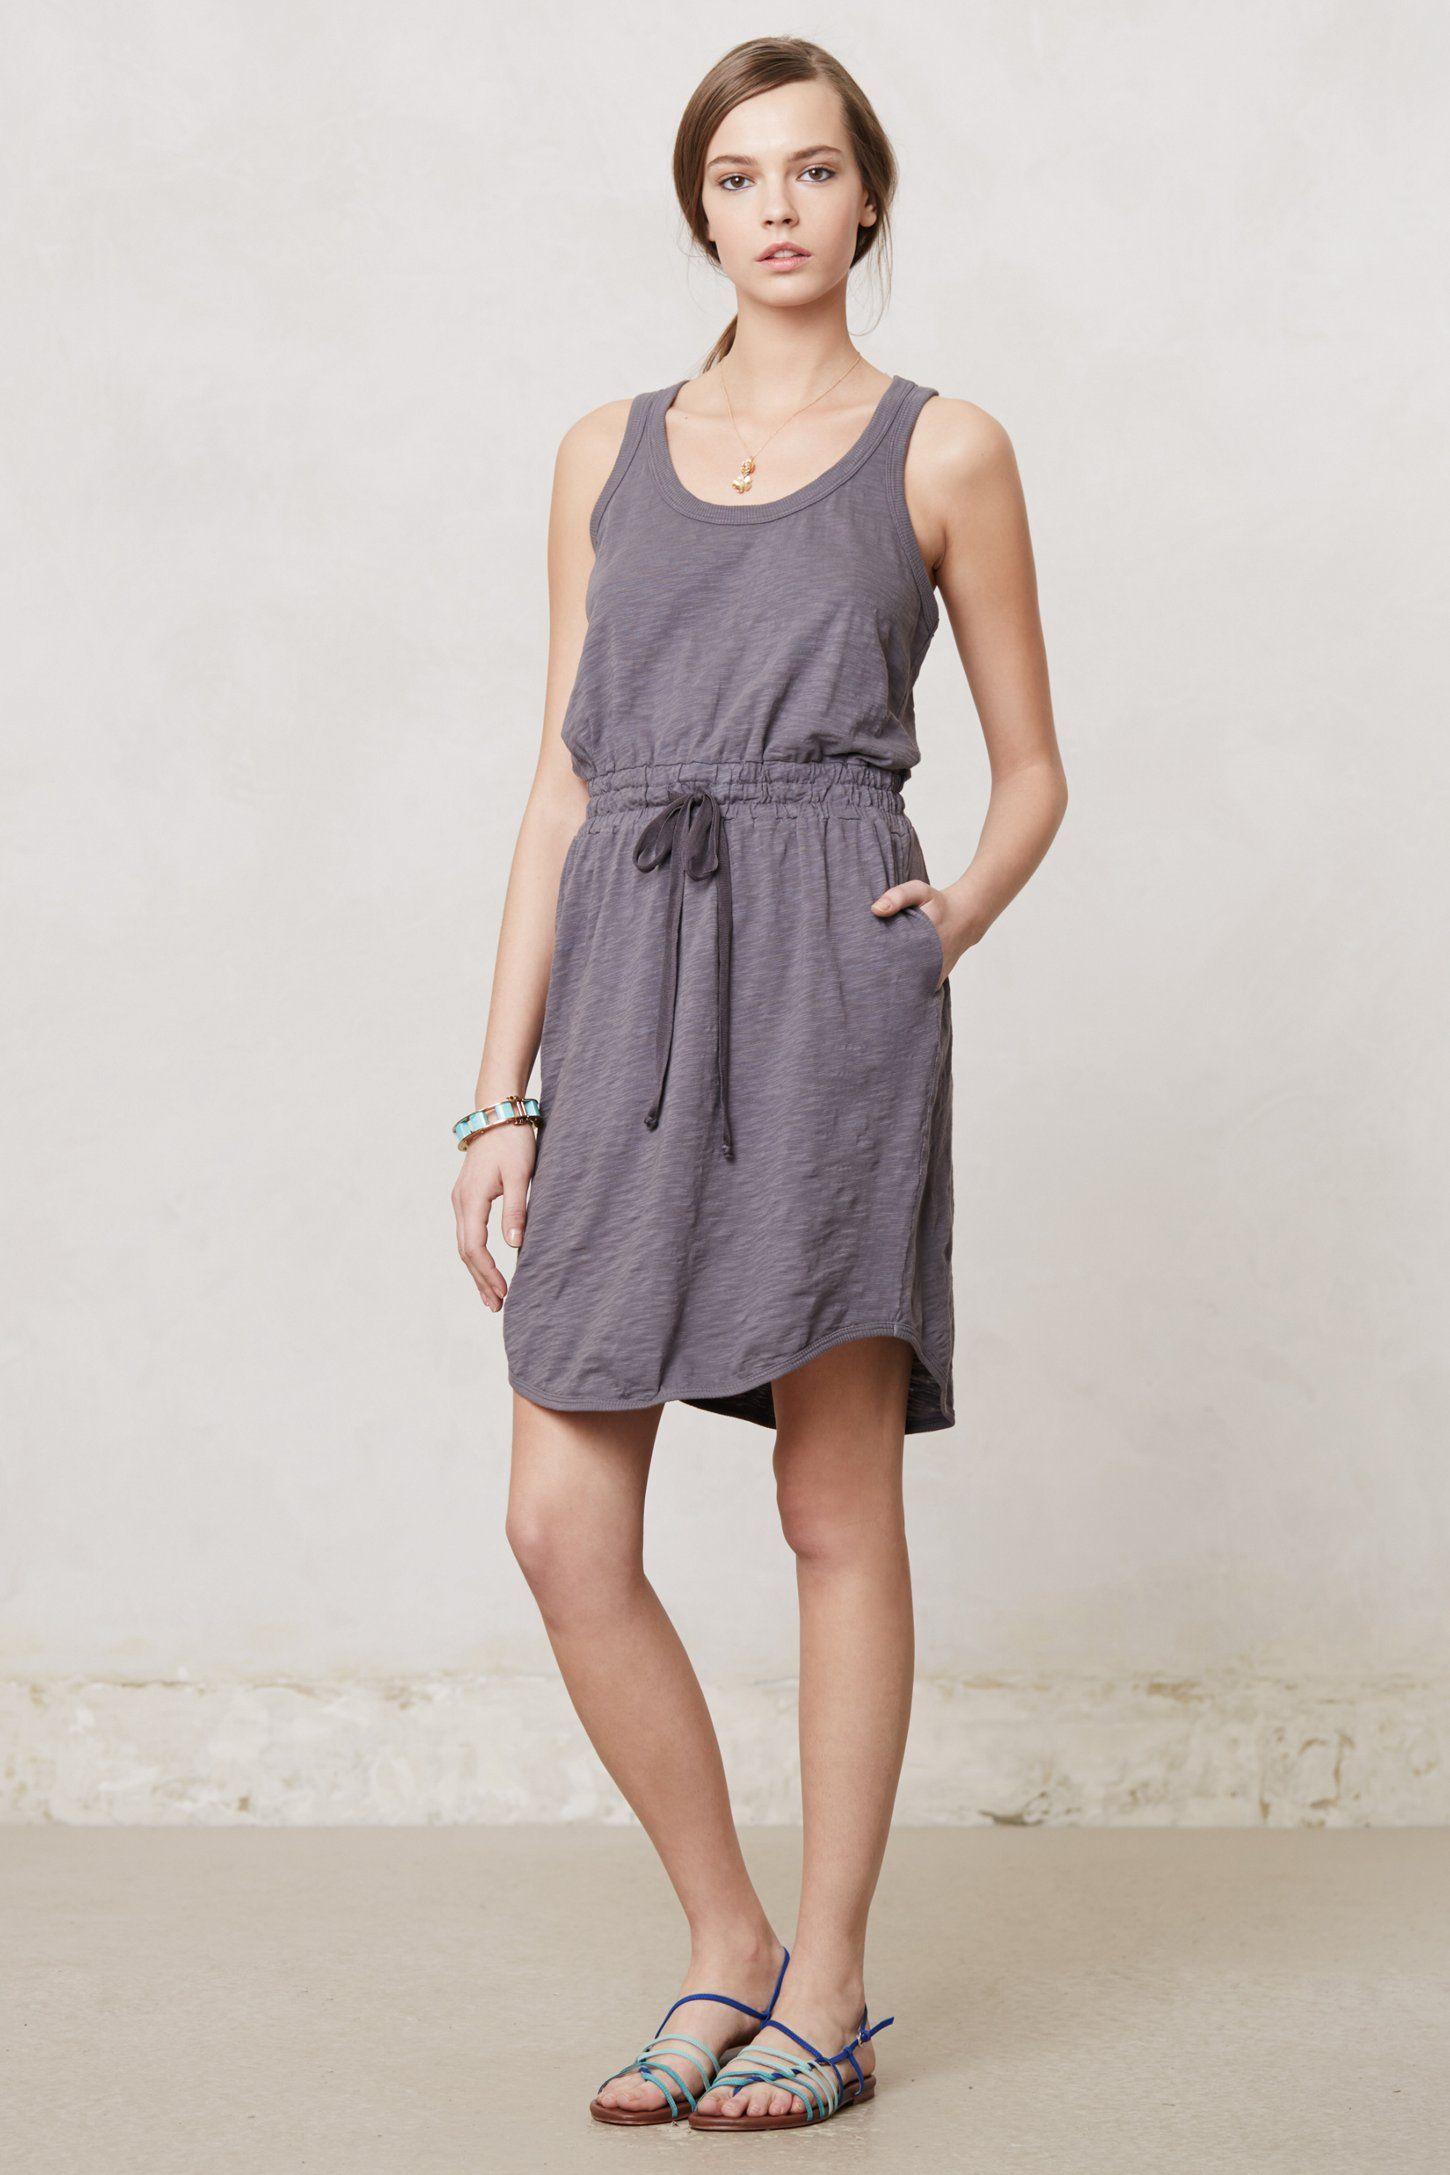 Eliot Tie Dress   Style   Pinterest